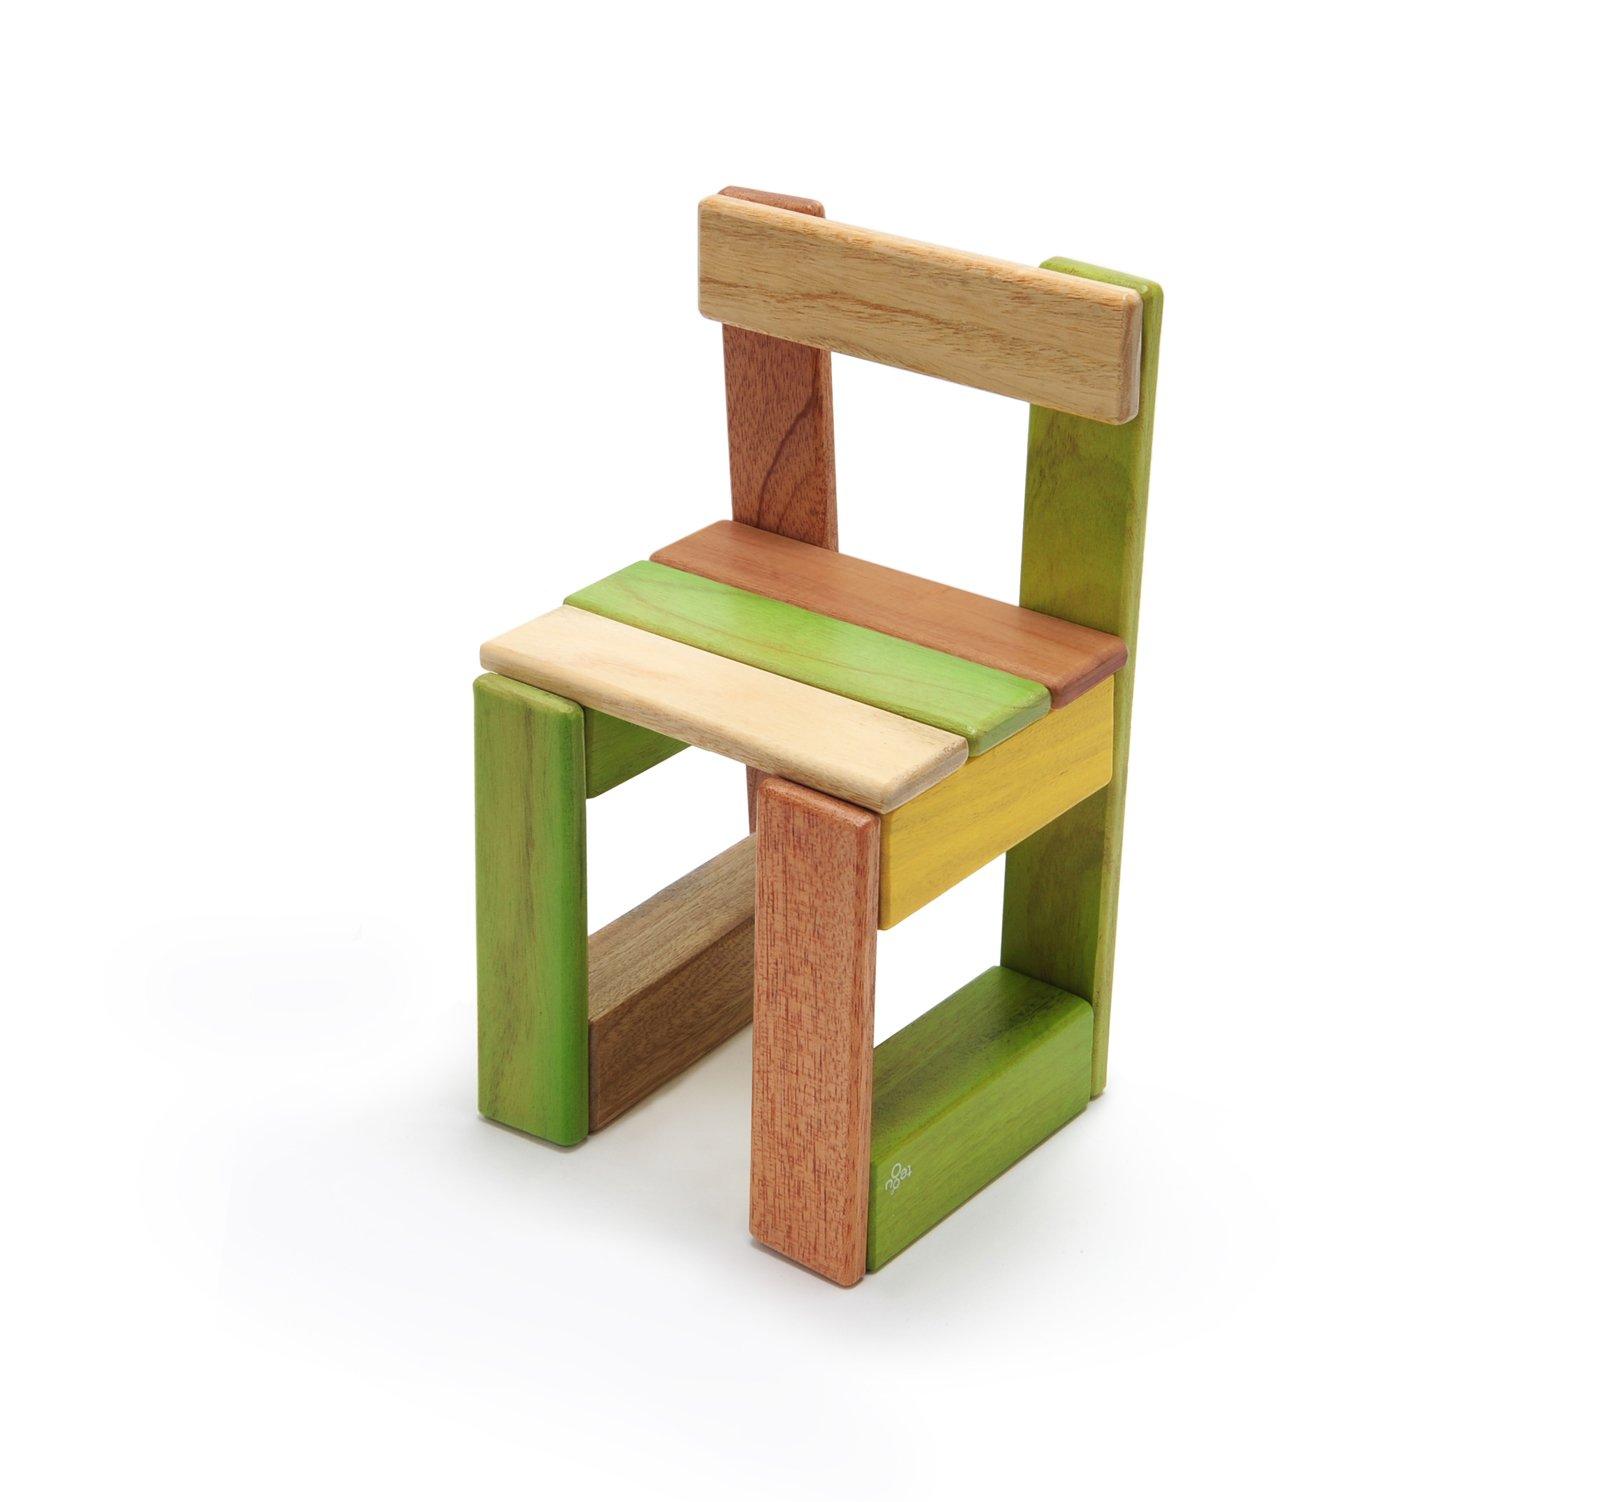 22 Piece Tegu Endeavor Magnetic Wooden Block Set, Jungle by Tegu (Image #4)